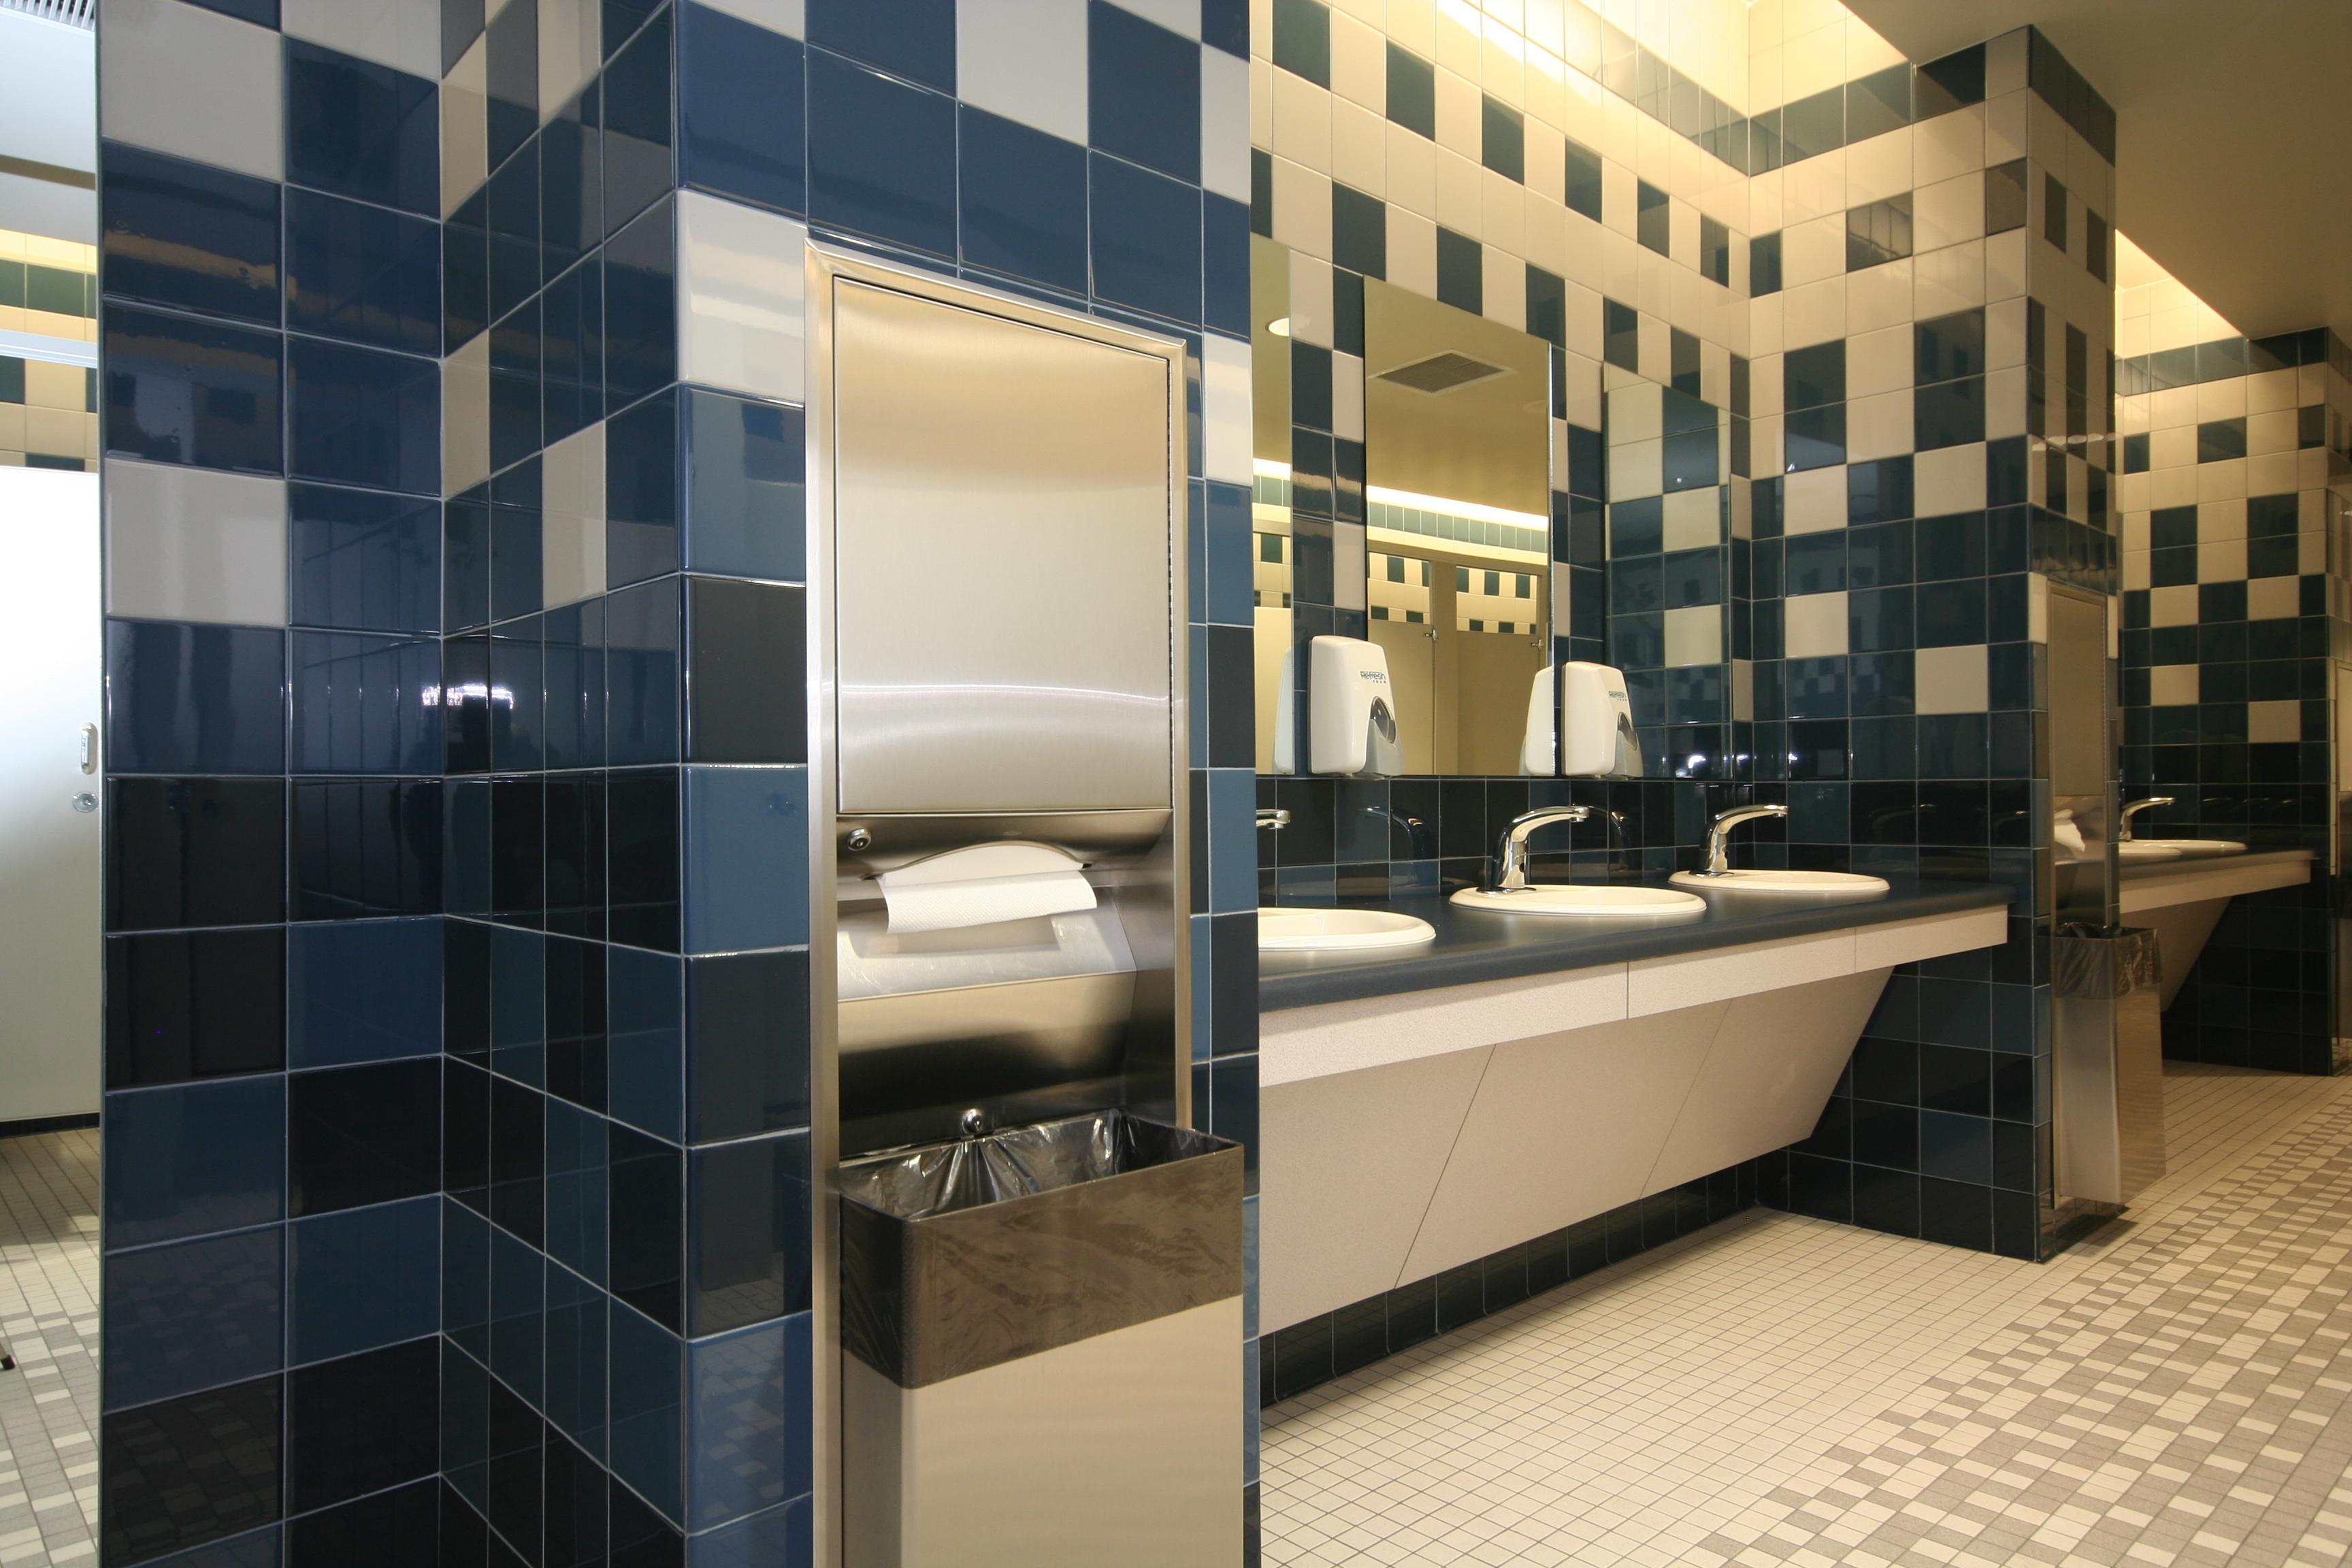 Bathroom Partitions Az partitions & accessories co mesa, az 85210 - yp